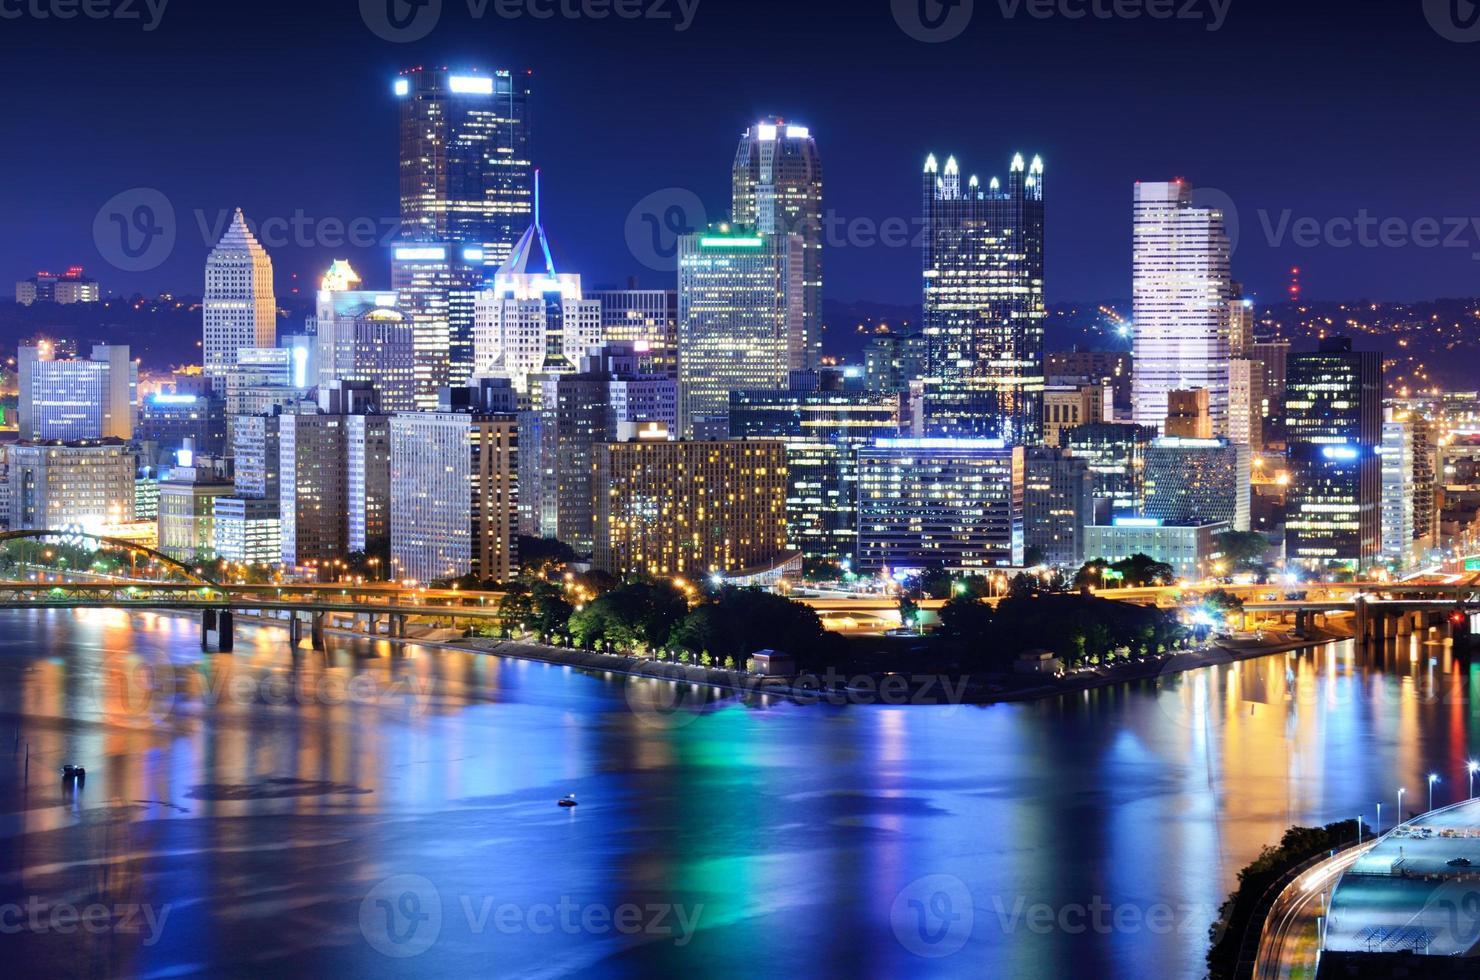 Downtown Pittsburgh Skyline photo